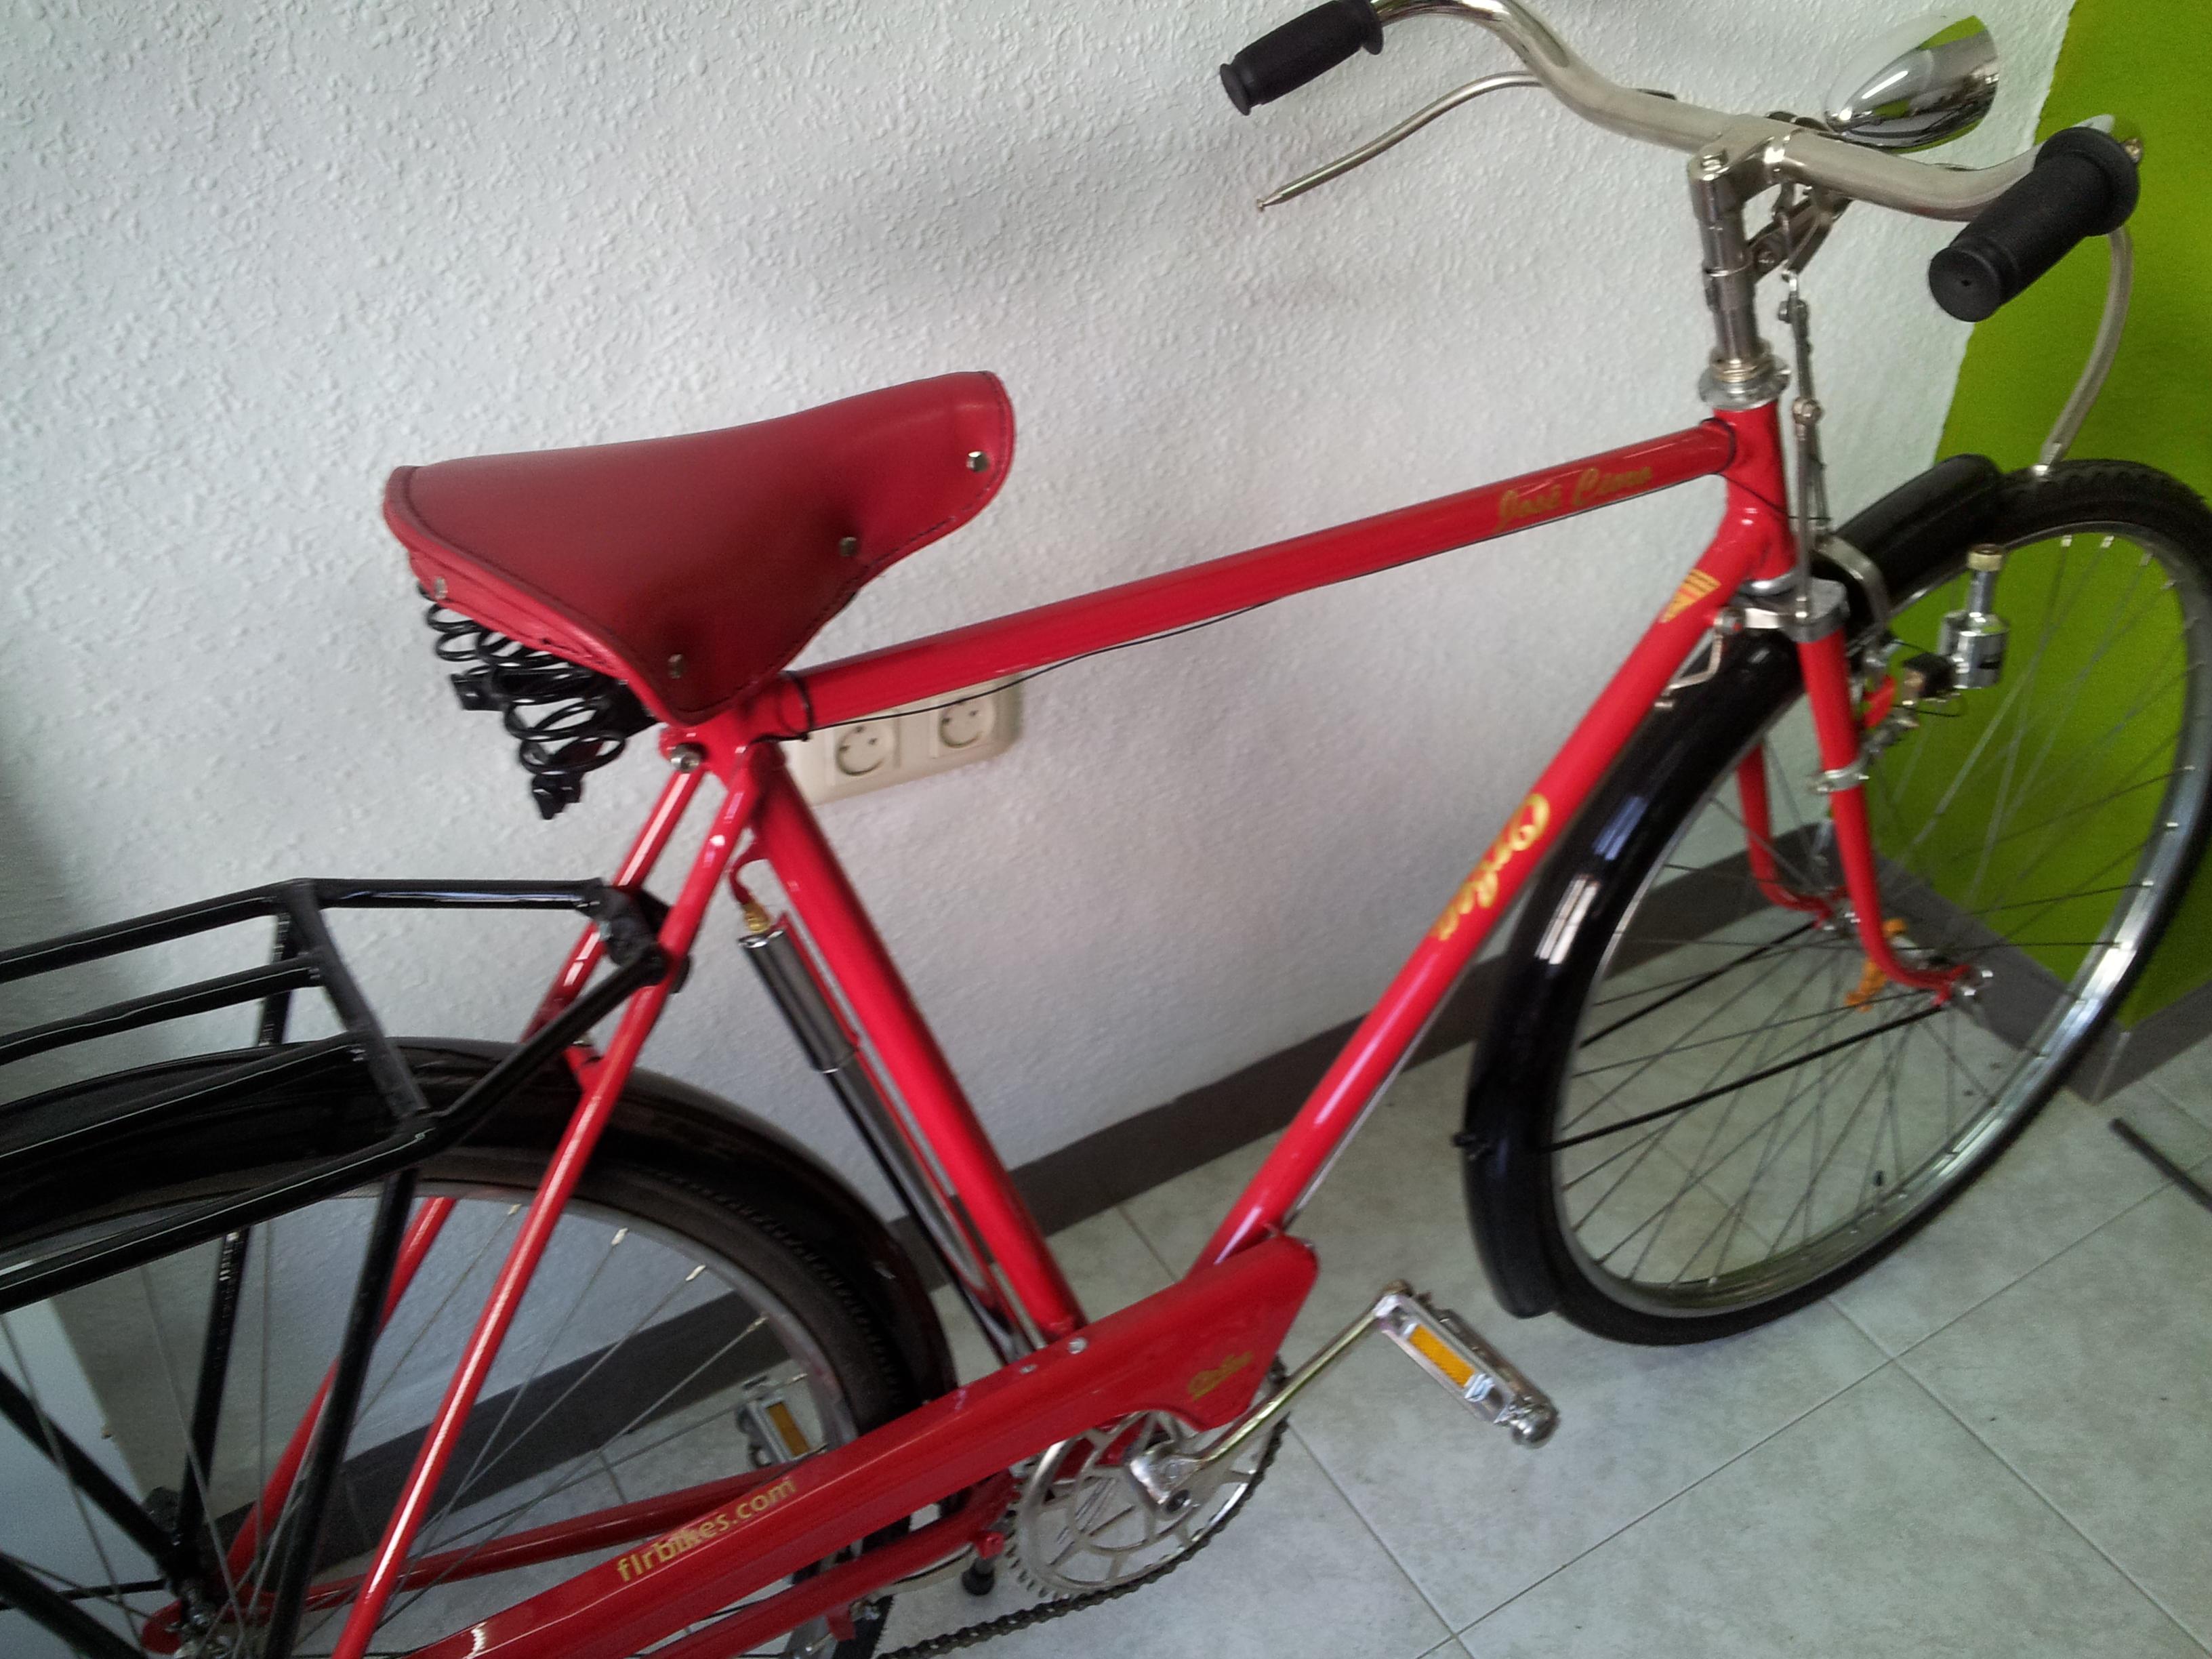 Bicicleta Restaurada Flr Bikes ~ Bicicletas Segunda Mano Salamanca